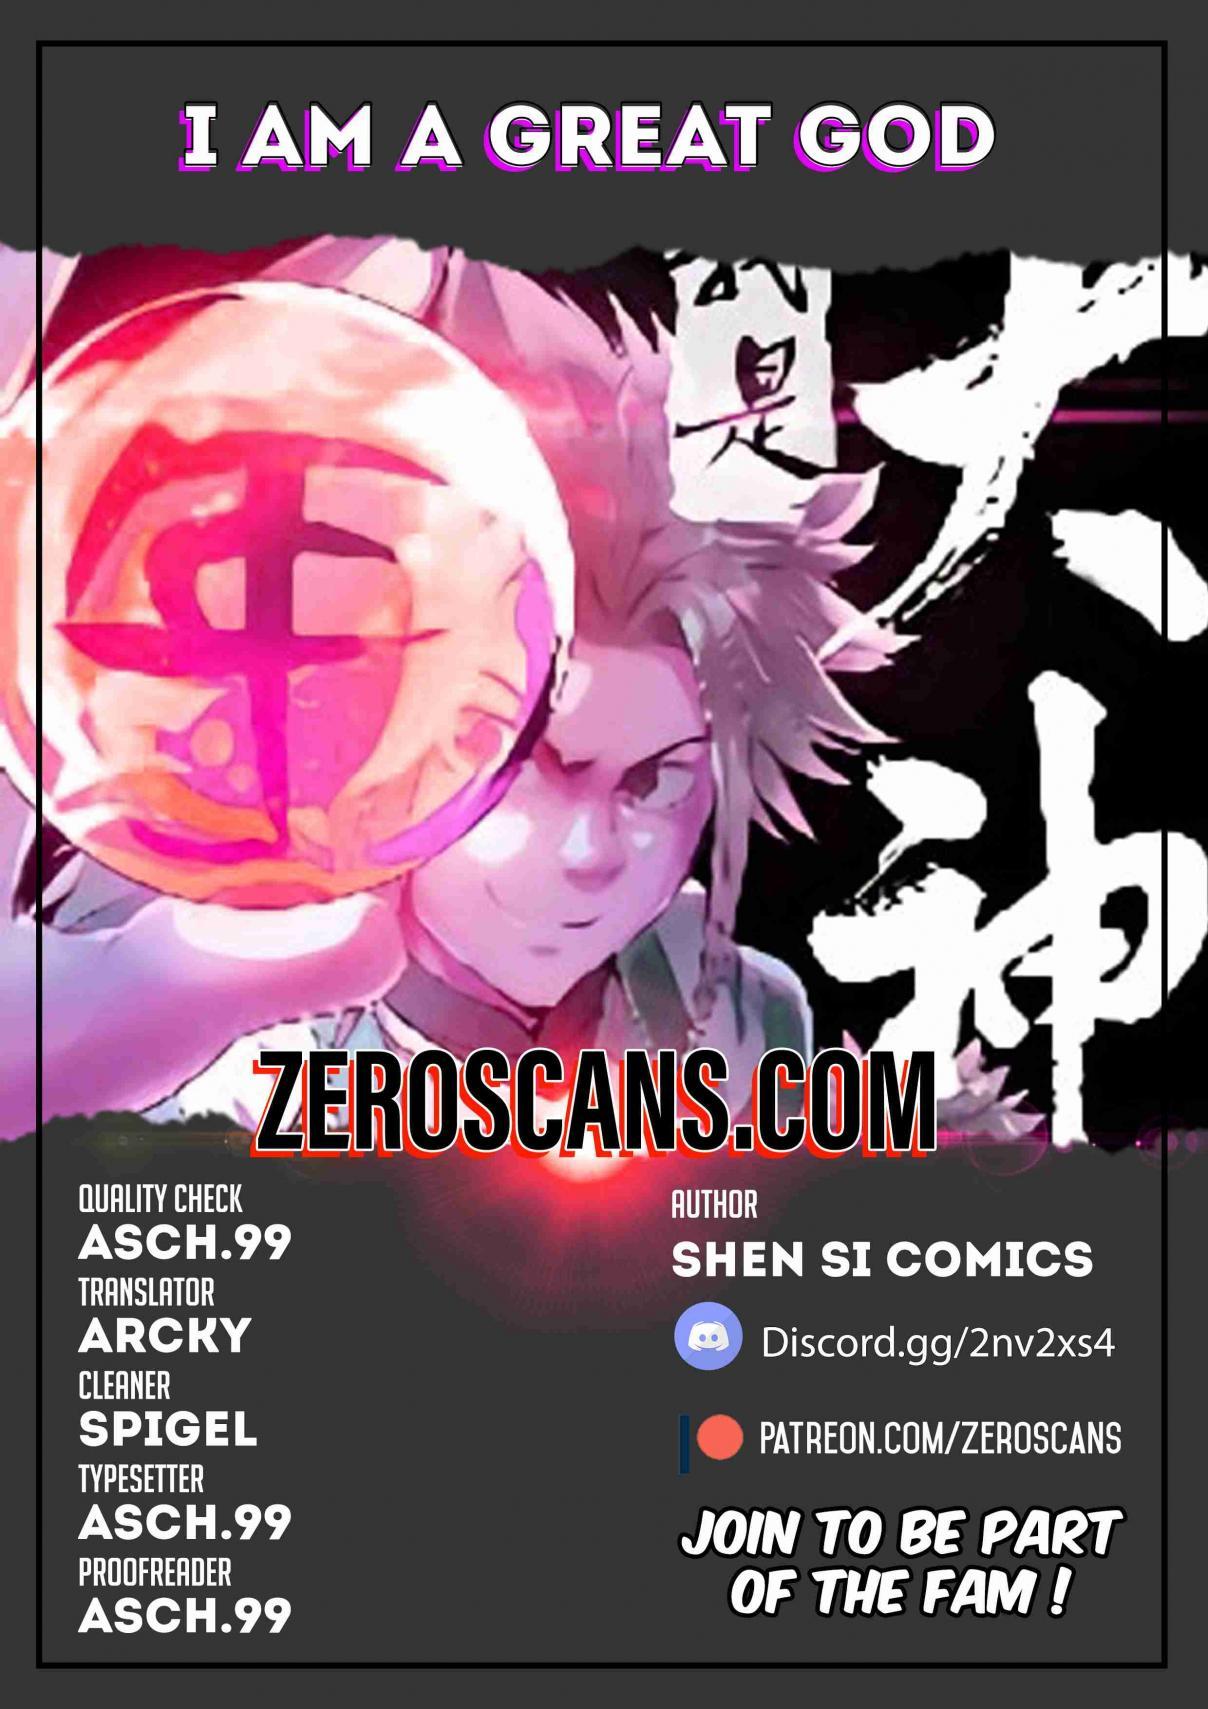 https://im.nineanime.com/comics/pic9/4/21124/512602/3a27c586296f9cdb115a34389d7a8dbf.jpg Page 1